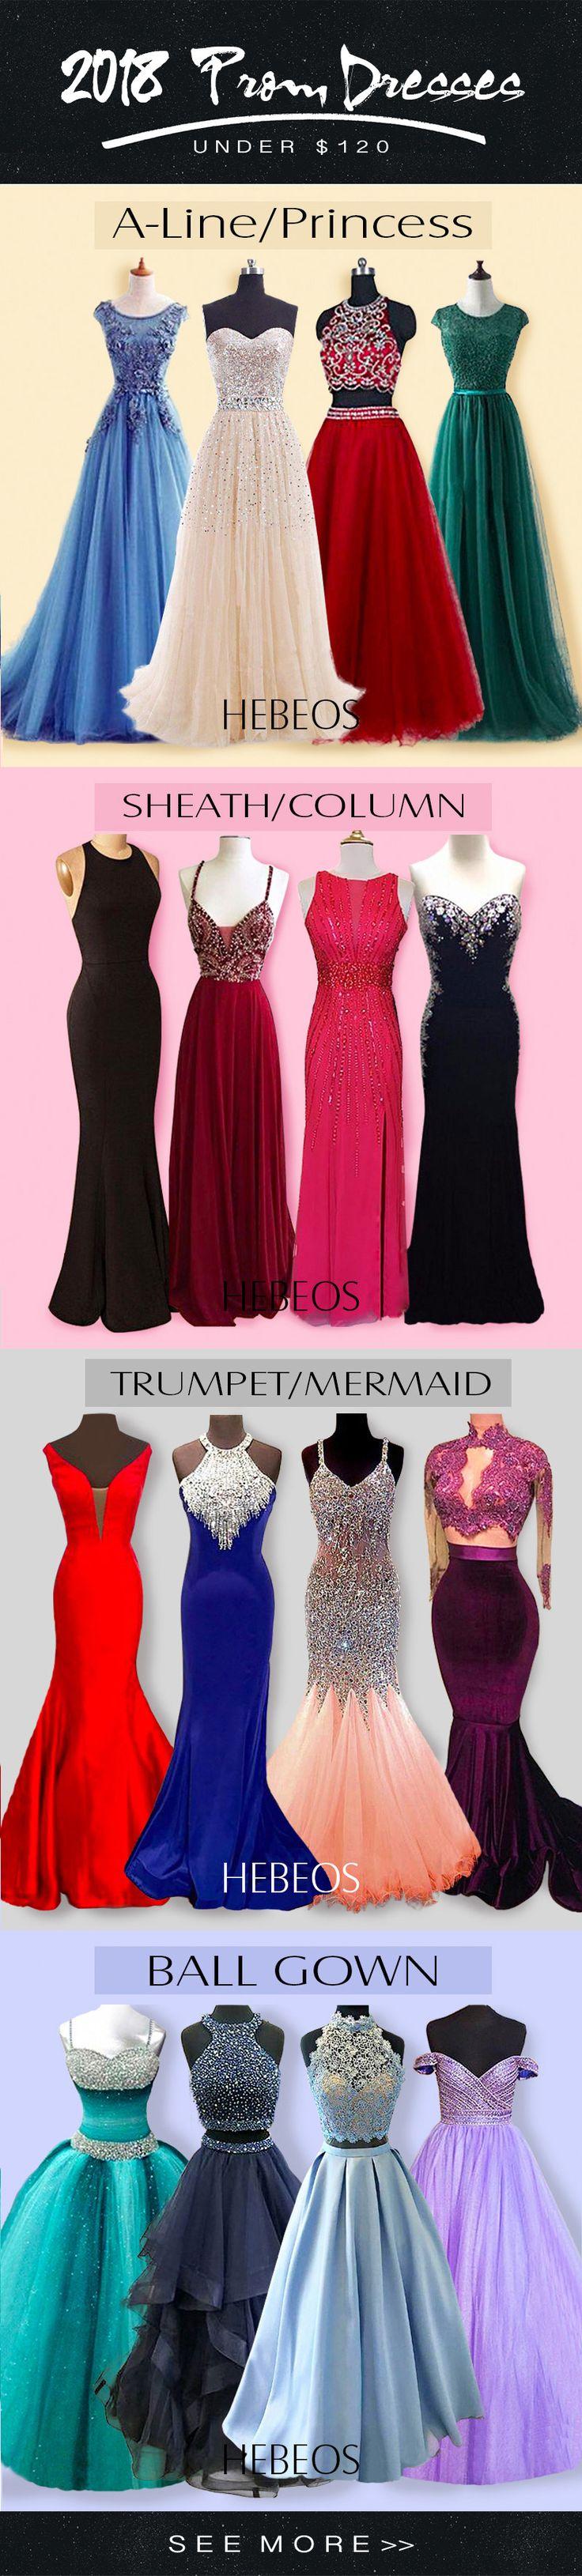 best prom dress images on pinterest ball gown ballroom dress